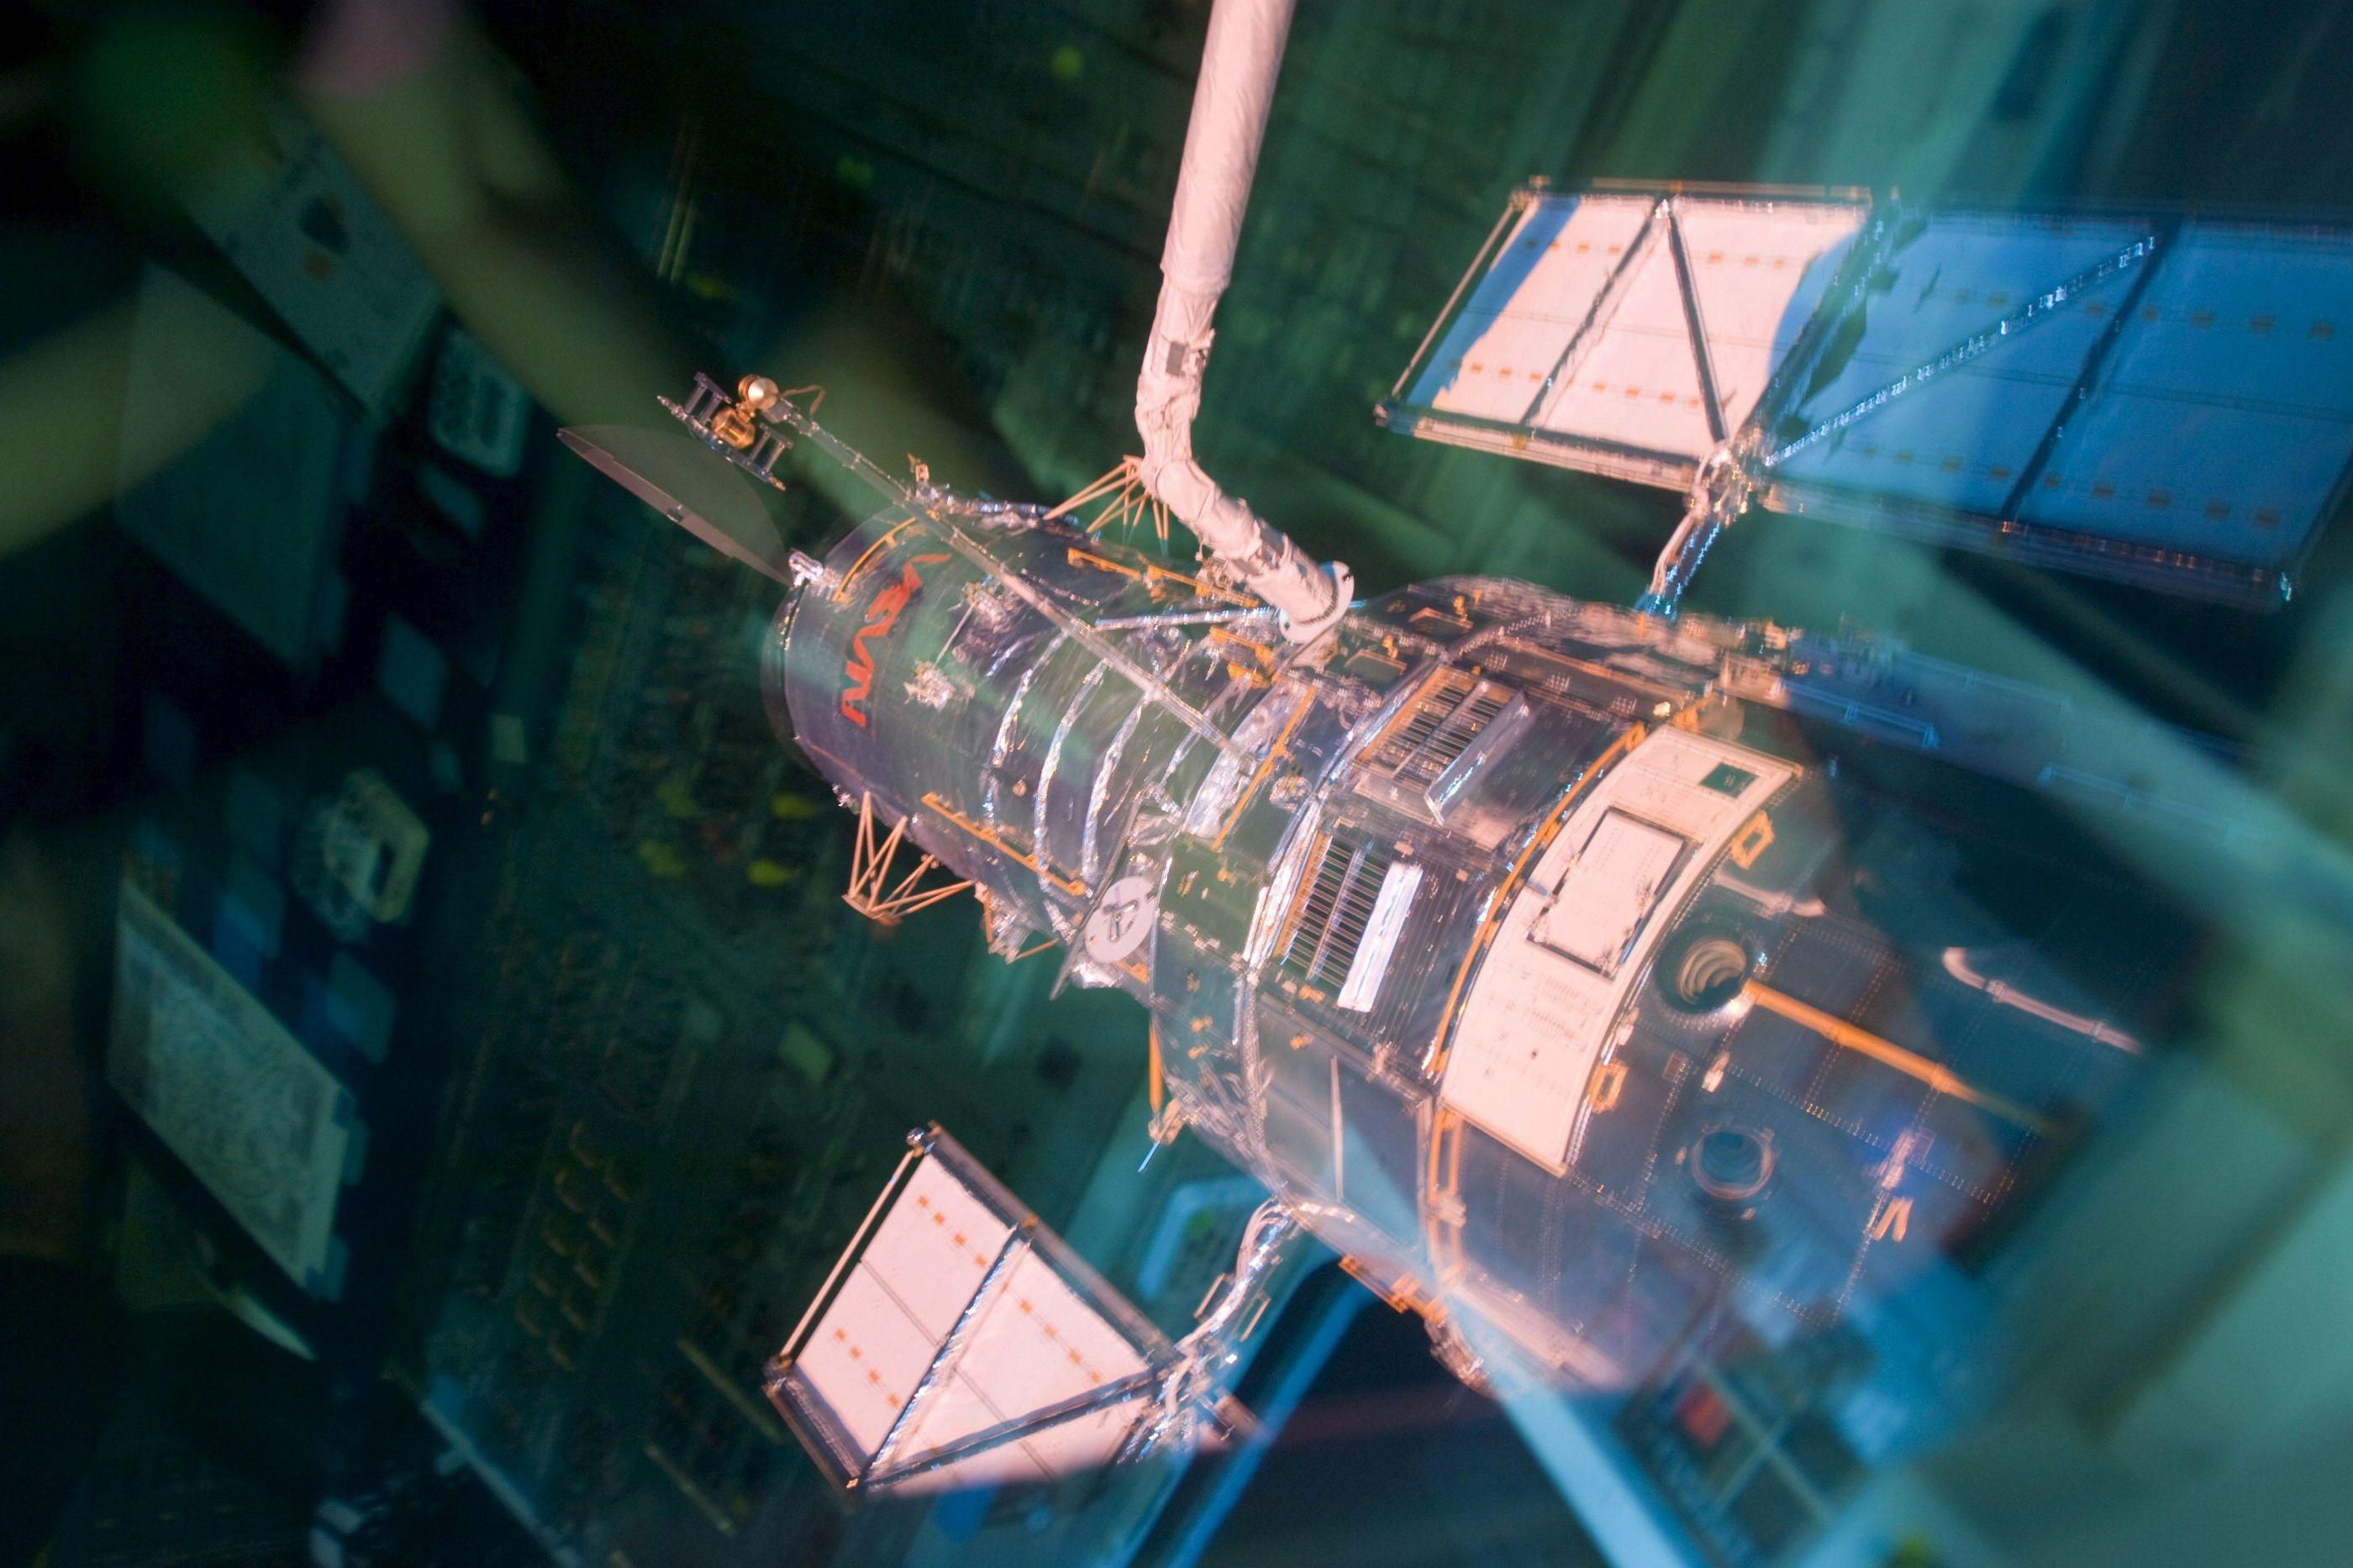 Telescópio espacial Hubble retoma observações